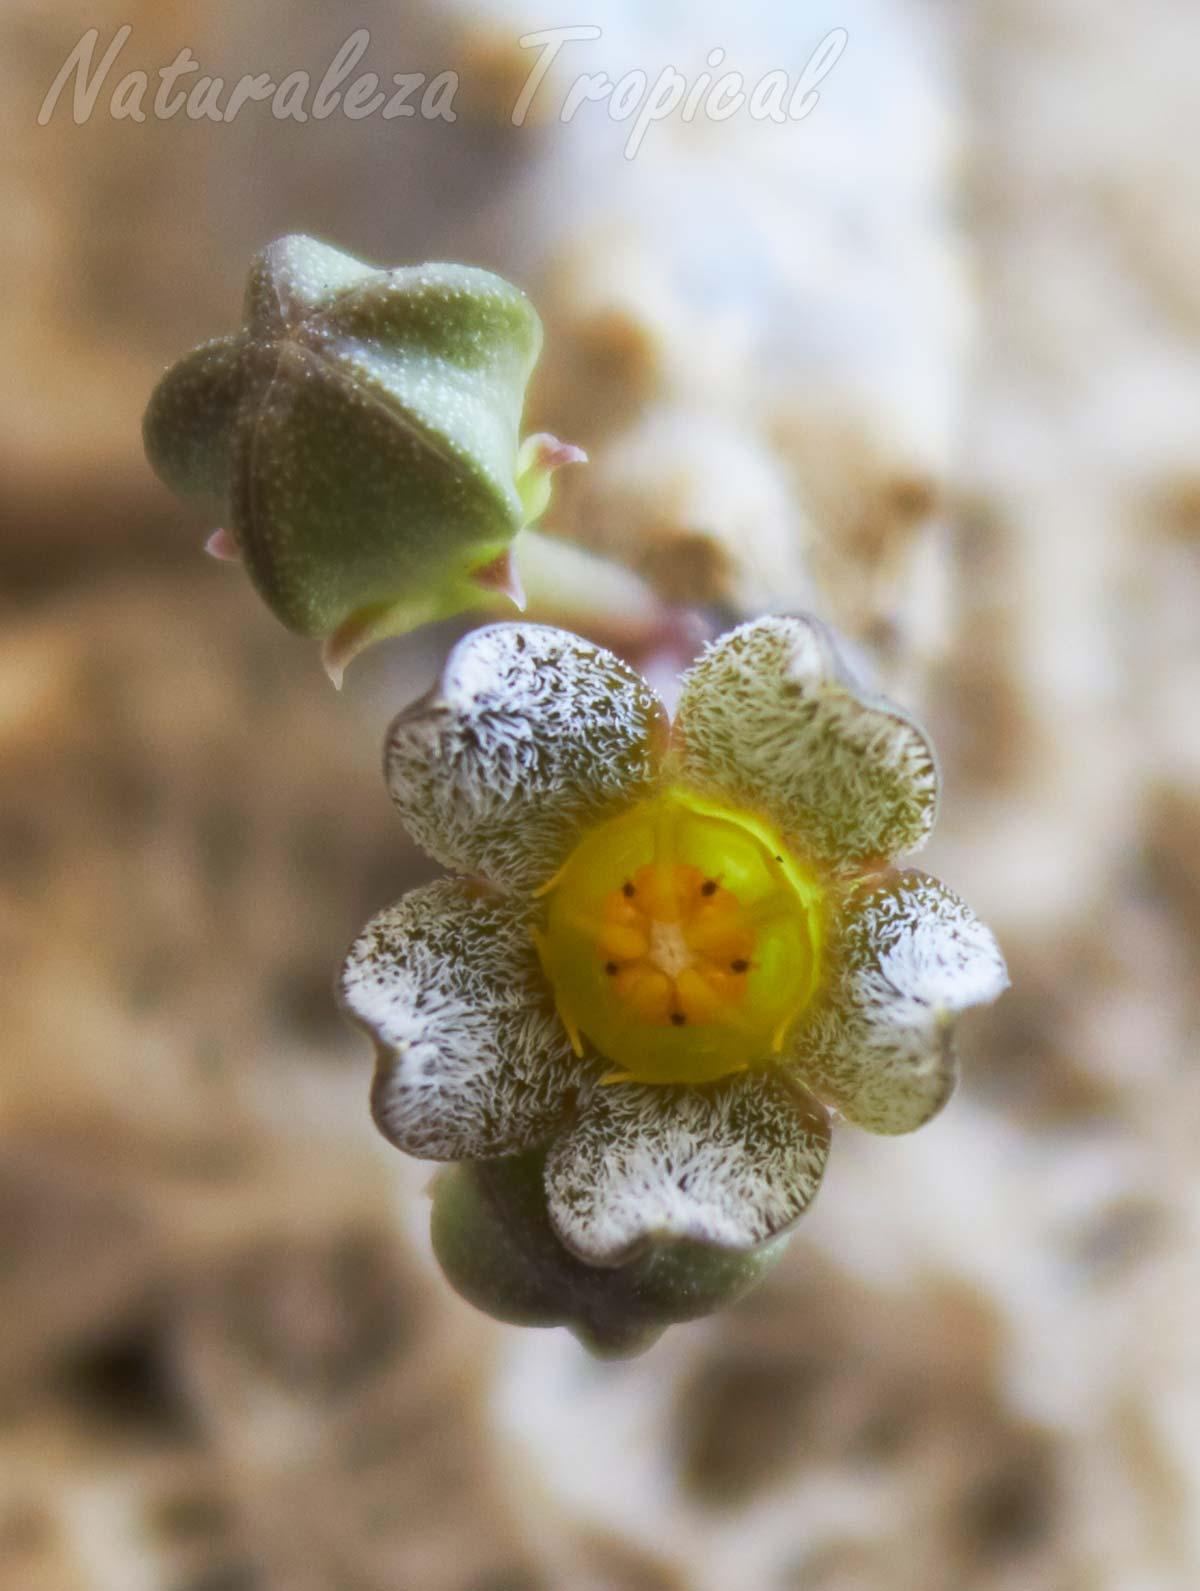 Otra foto de la flor de la planta suculenta Caralluma burchardii ssp. maura